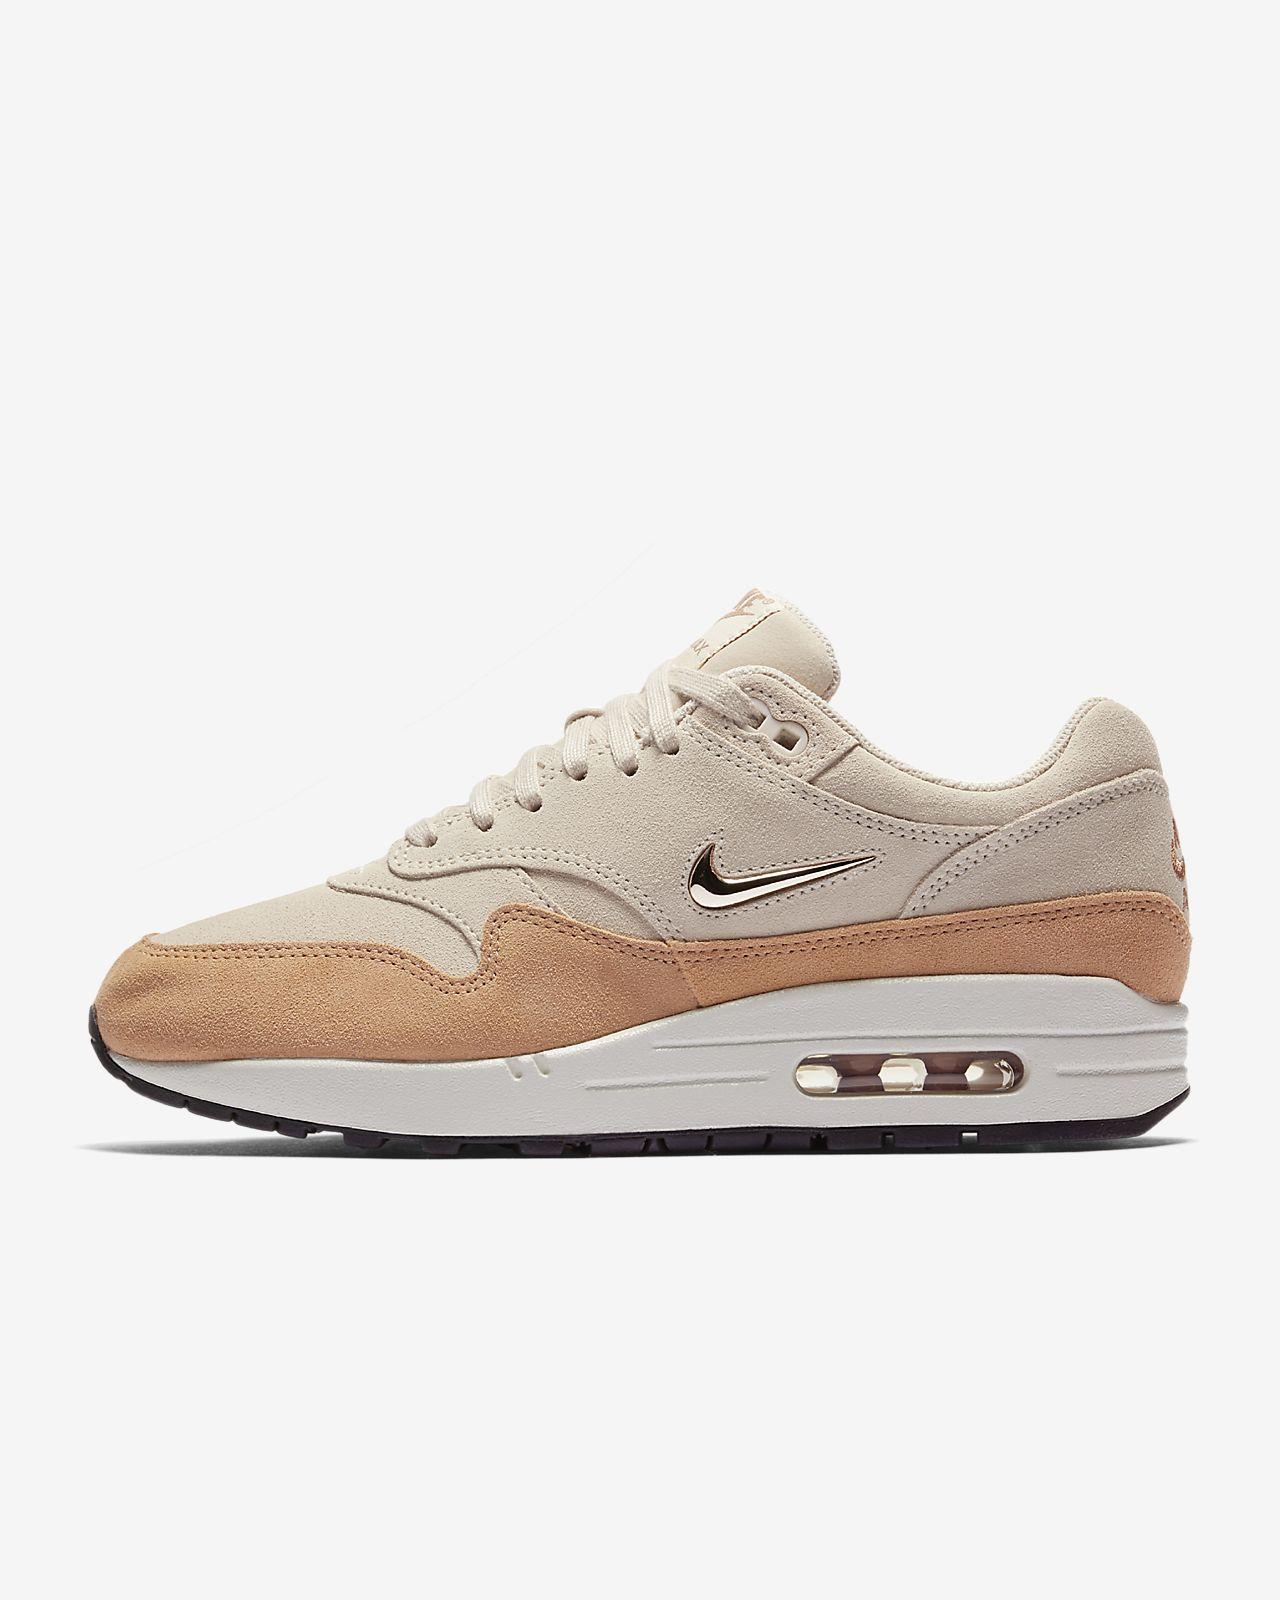 hot sale online 52648 1330d Nike Air Max 1 Premium SC